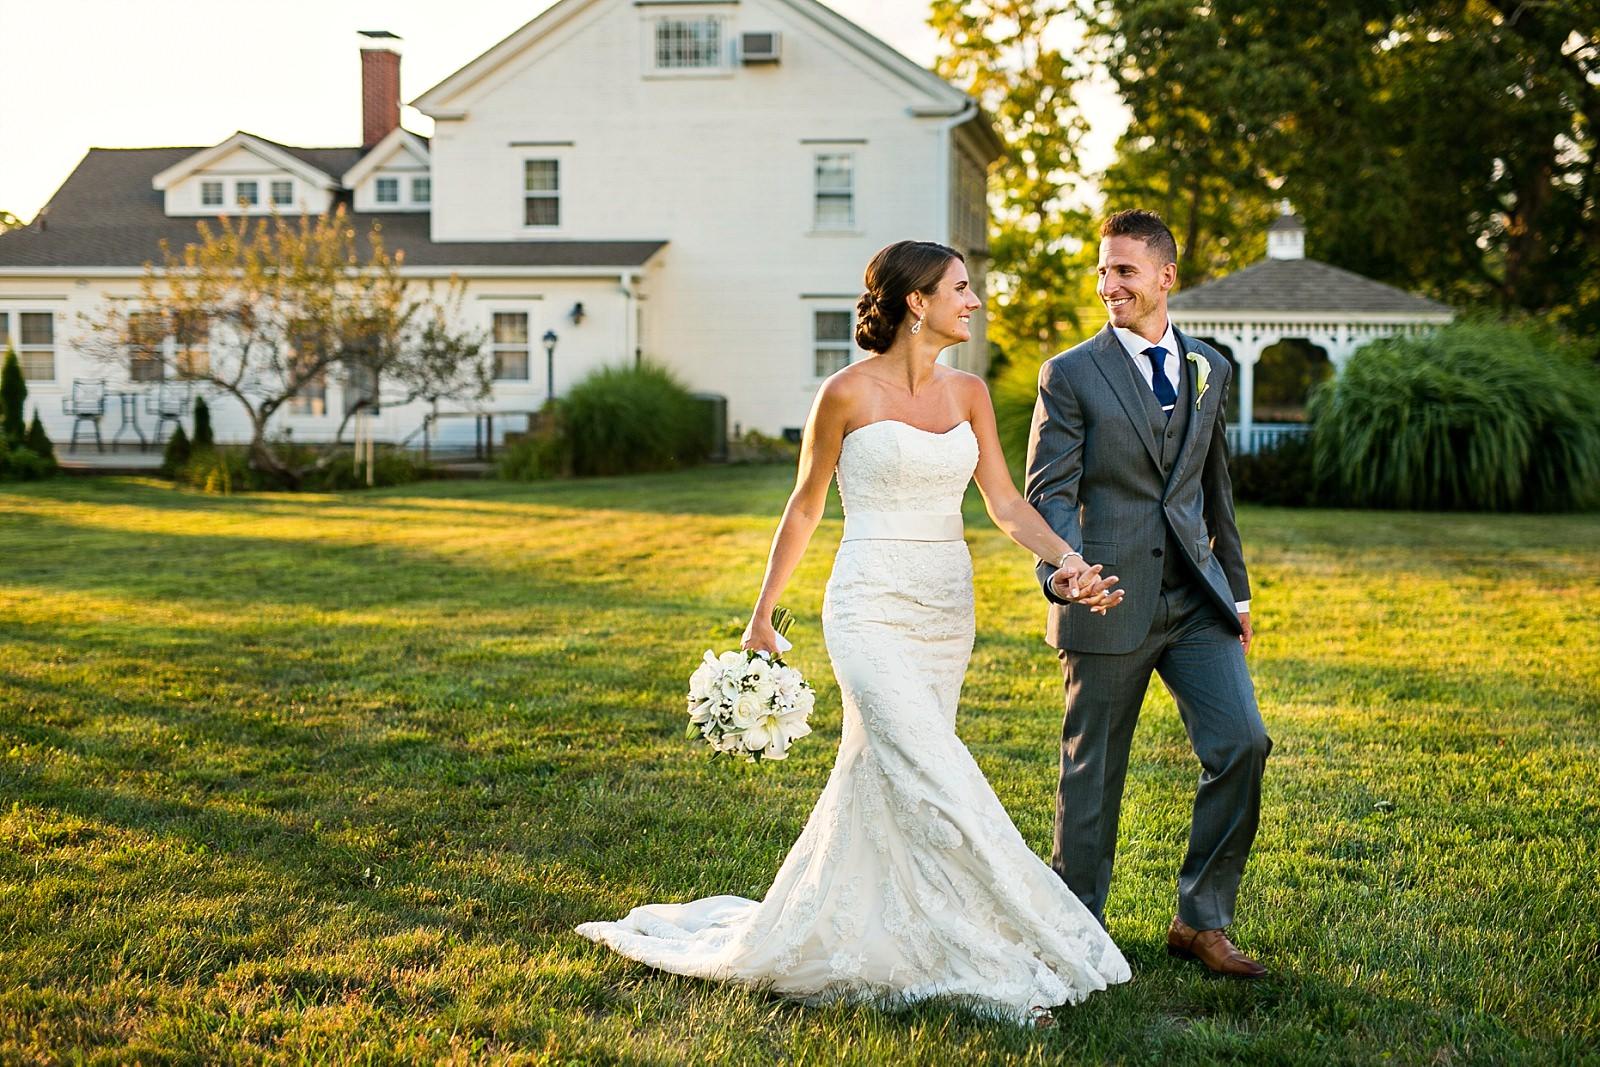 CT_Wedding_Photographer_LiNa_Wed_58.jpg